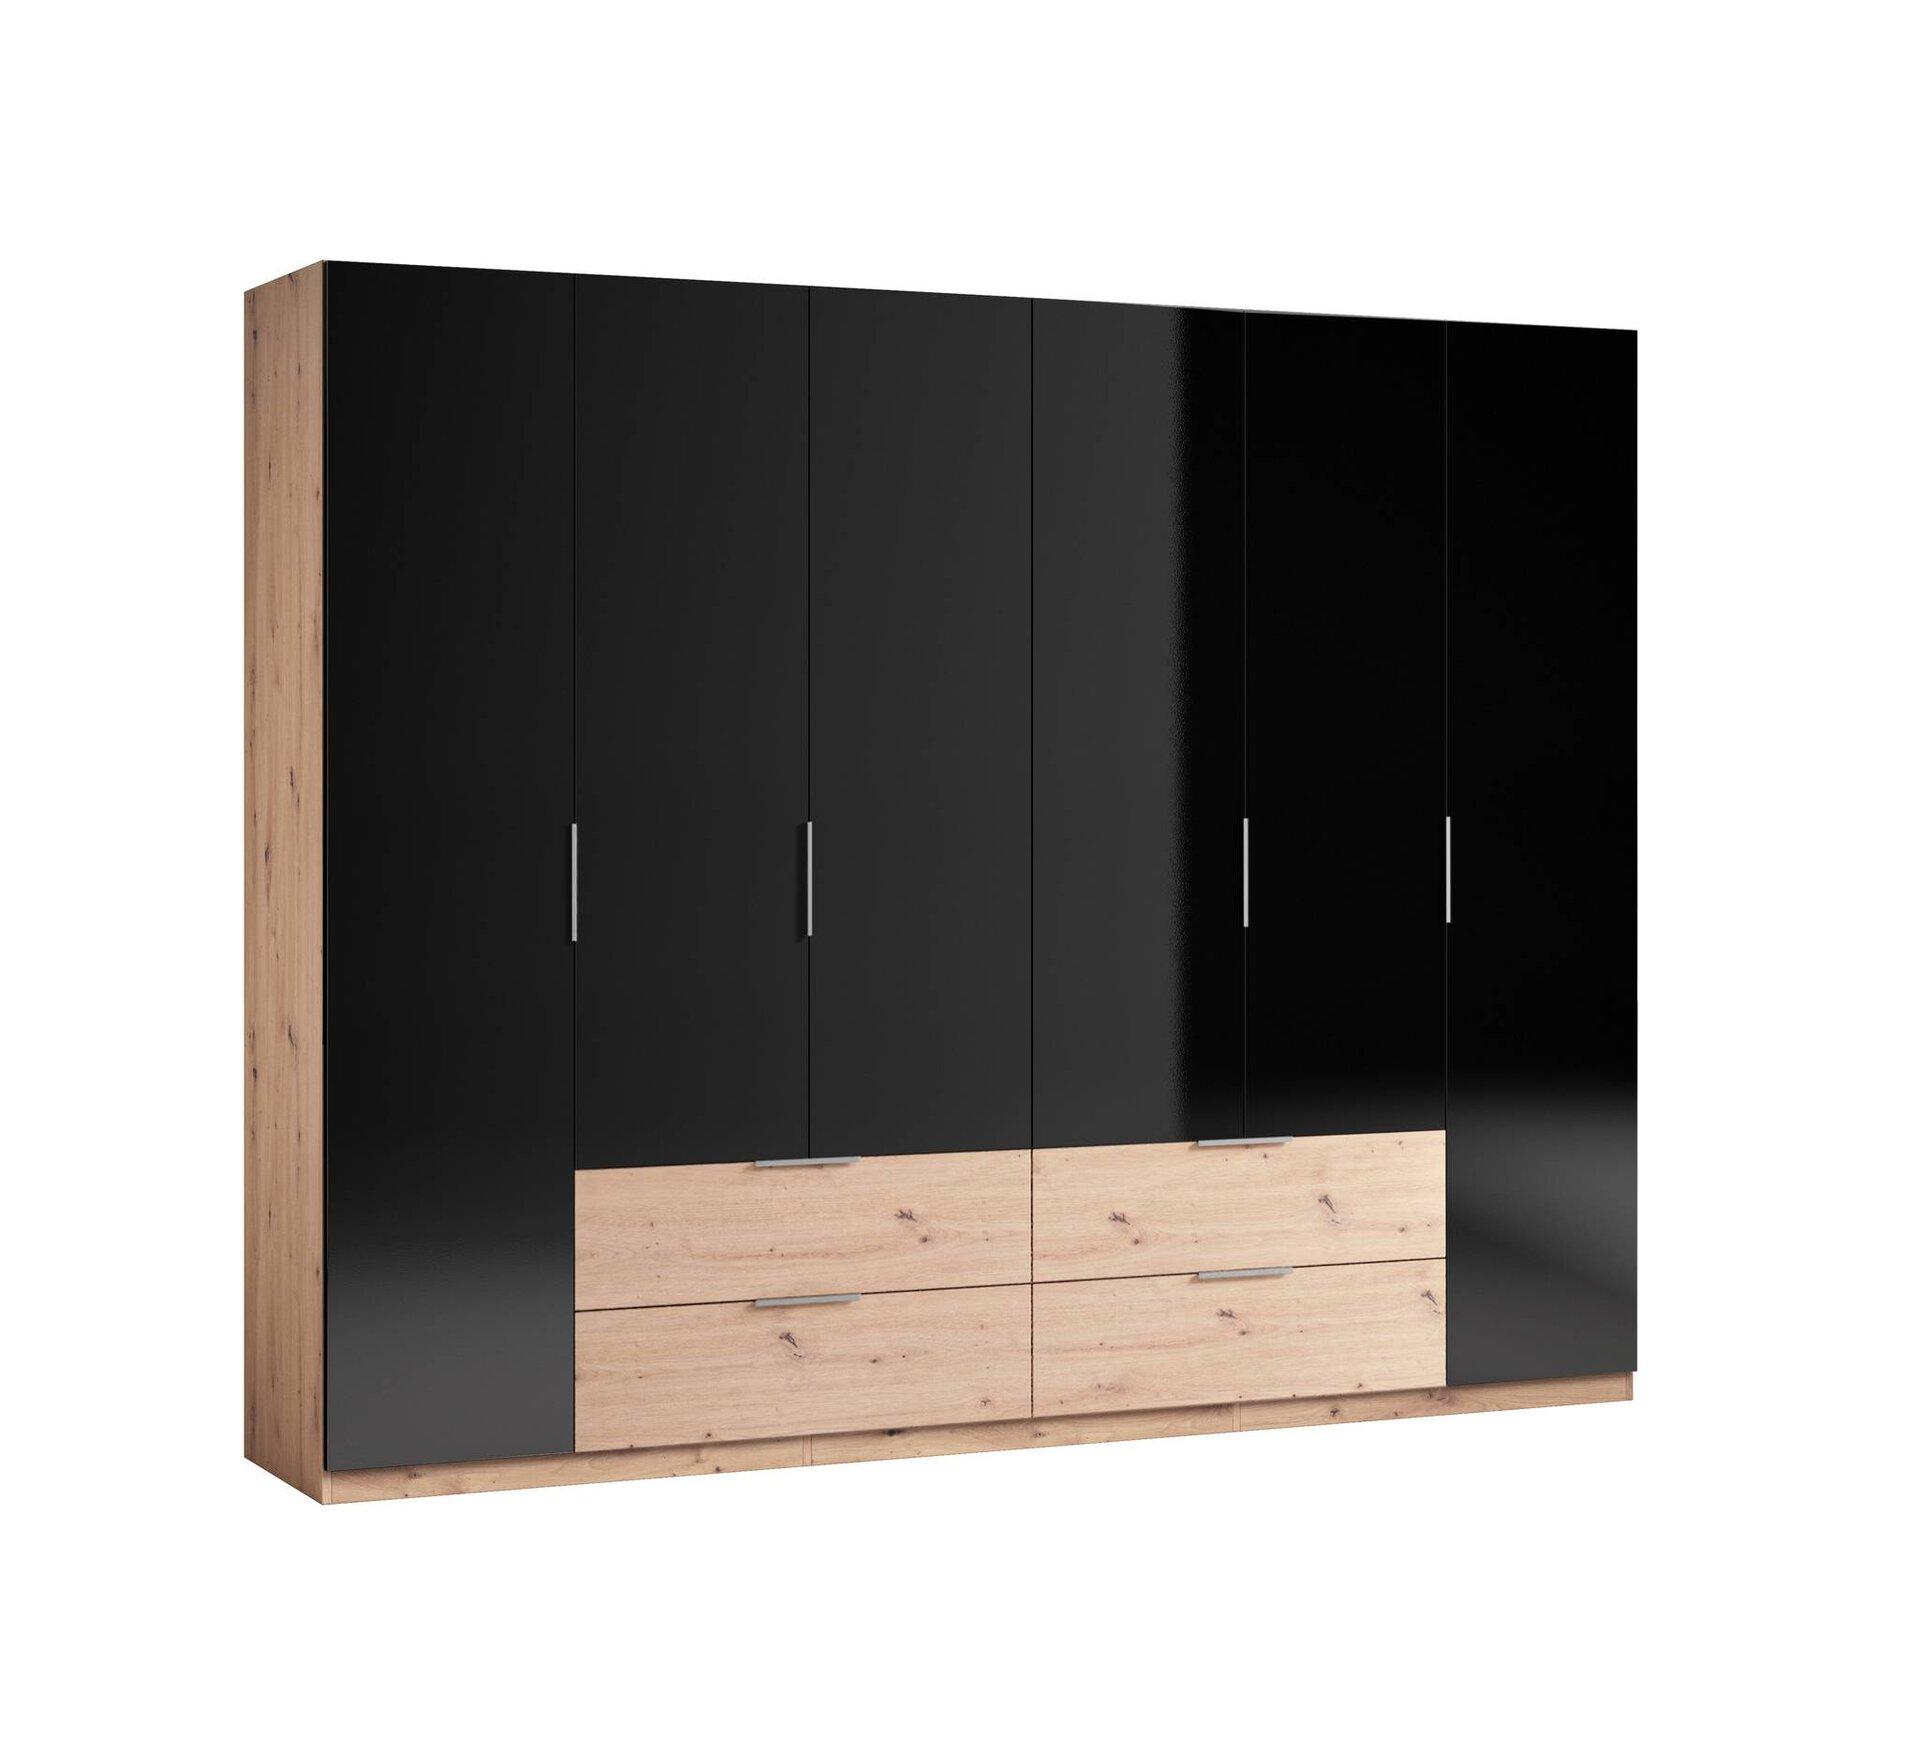 Drehtürenschrank PADUA LIV'IN Holzwerkstoff 56 x 211 x 269 cm